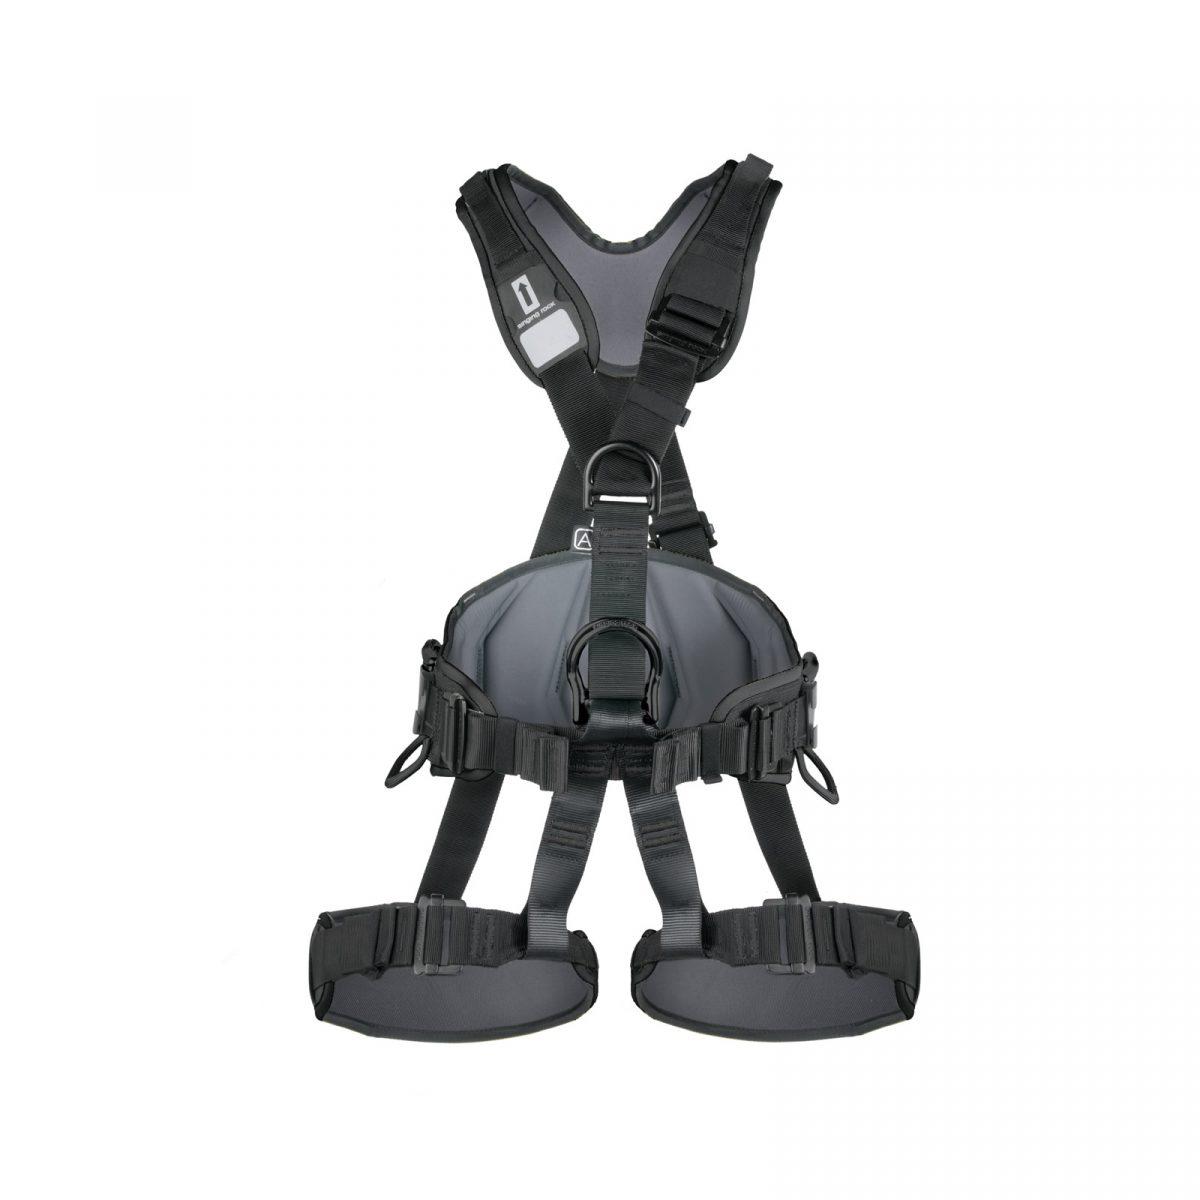 uprząż PROFI WORKER 3D STANDARD BLACK